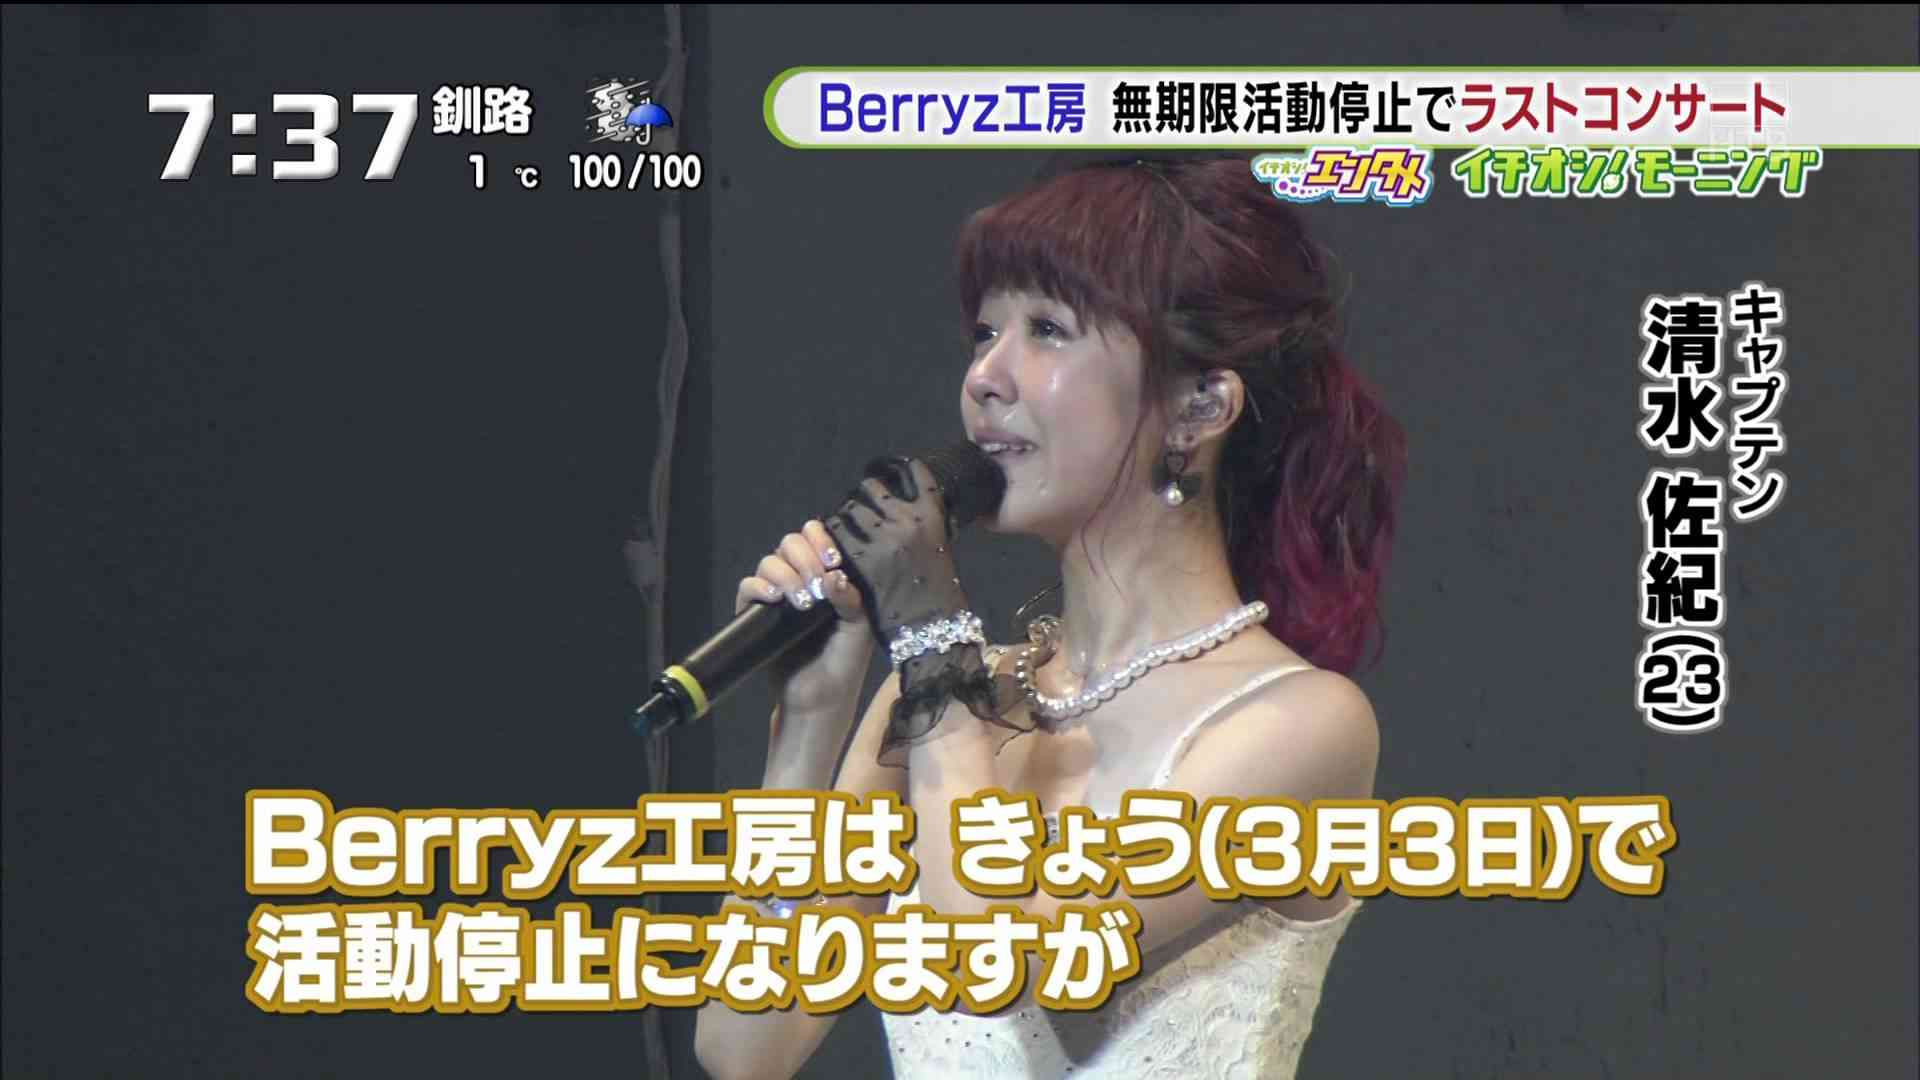 Berryz工房 北海道ローカル150304 - YouTube